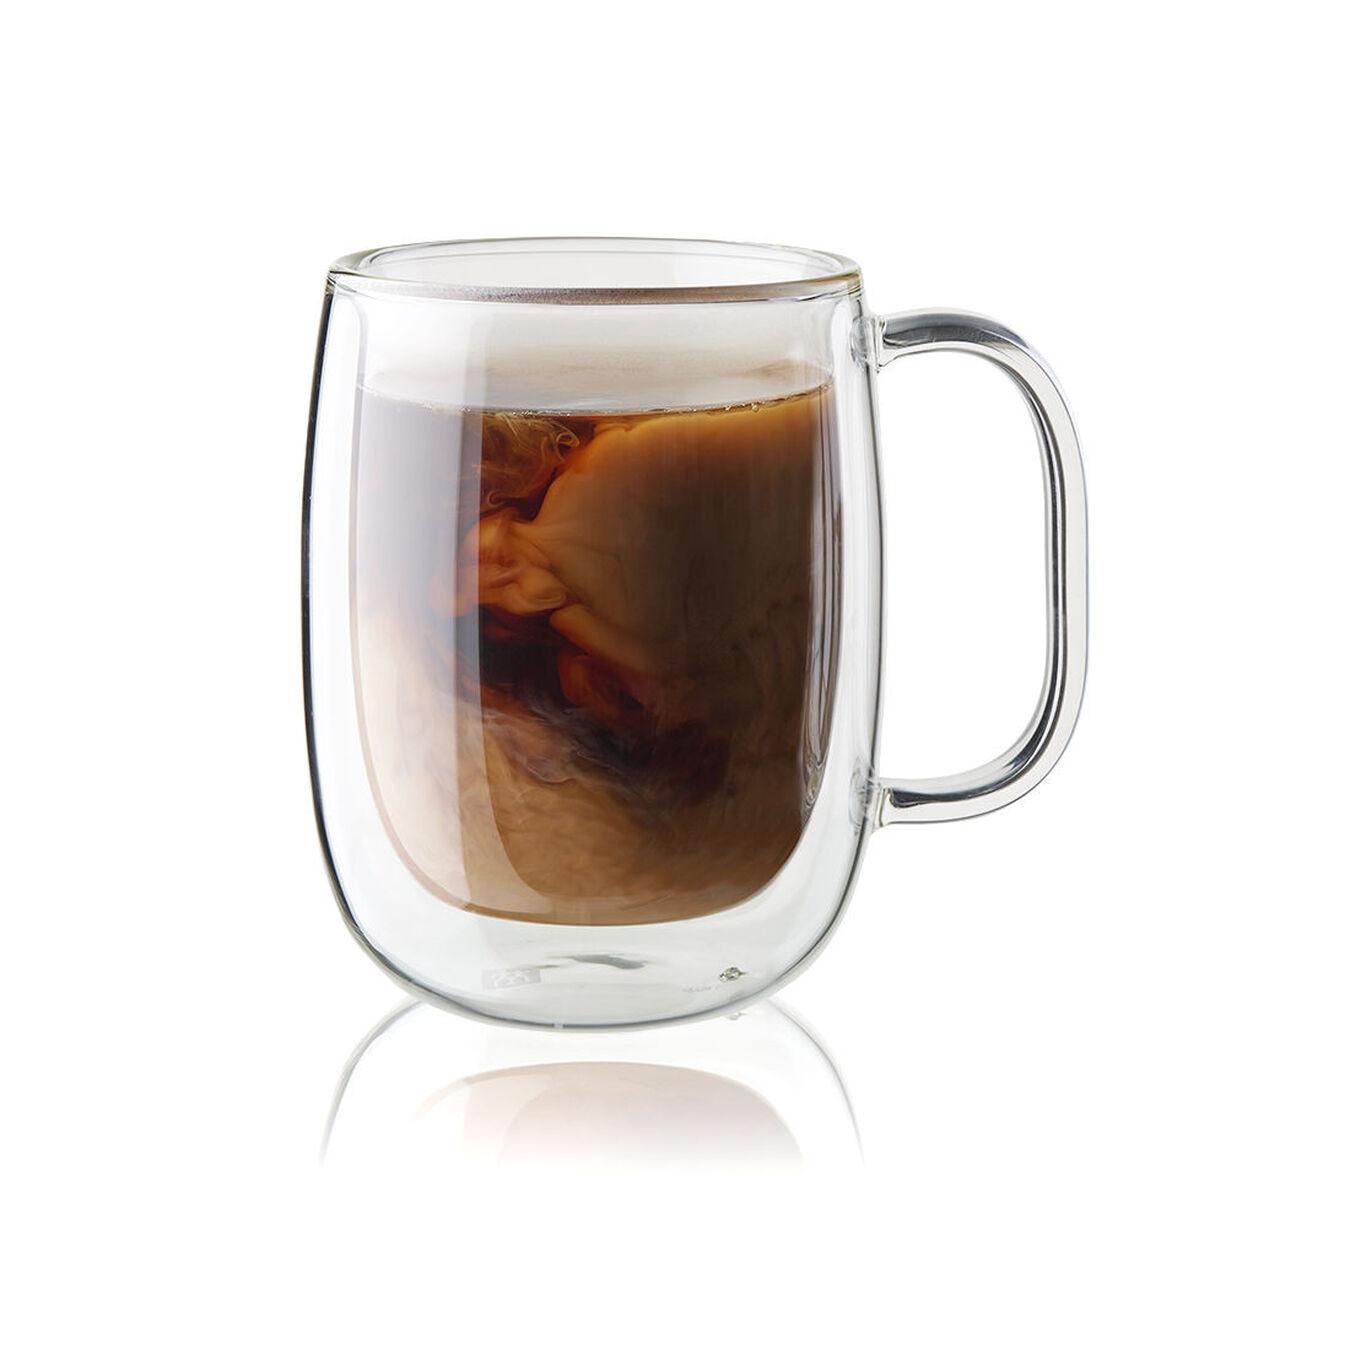 4-pc Double-Wall Glass Coffee Mug Set,,large 2